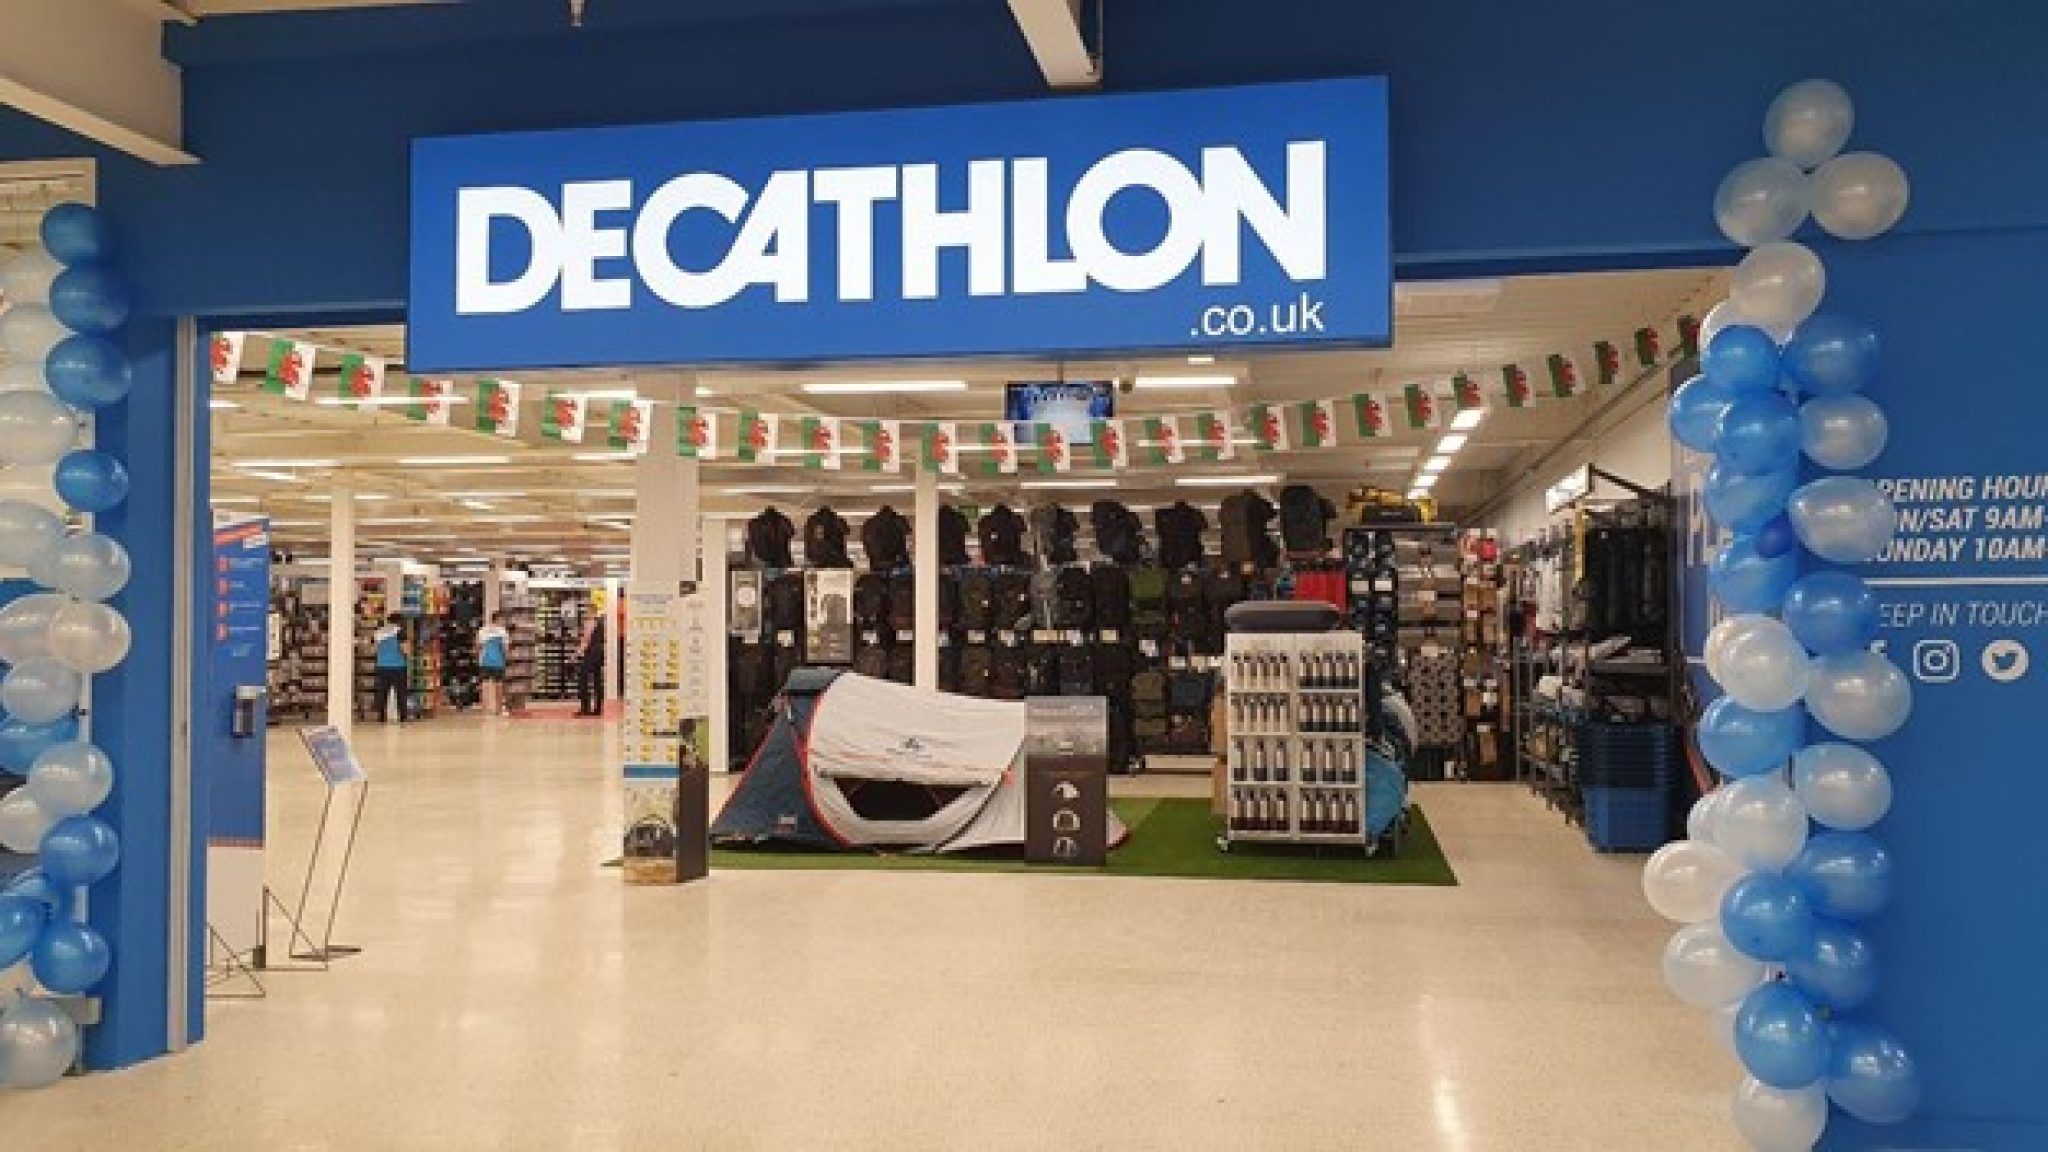 Decathlon taking part in World Clean Up Day